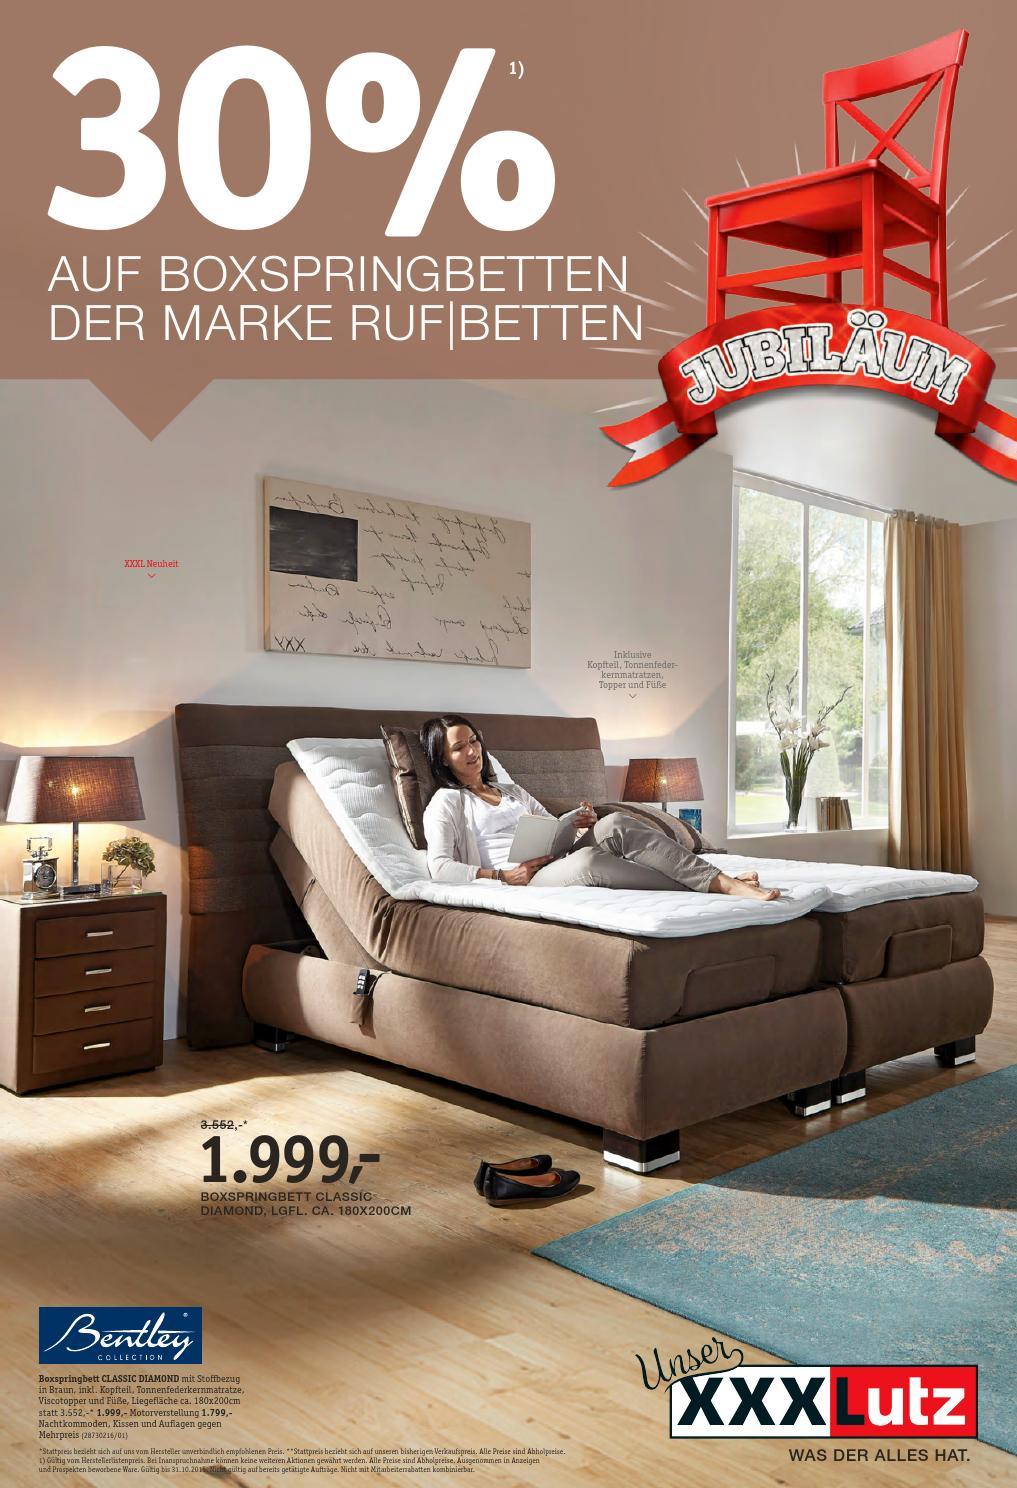 Ruf Milano Boxspringbett Exclusiv Qlx Betten Boxspring Test Xxxlutz 0510 3110 By Rakouske Letaky Fabrikverkauf Schlafzimmer Set Mit Preise Bett